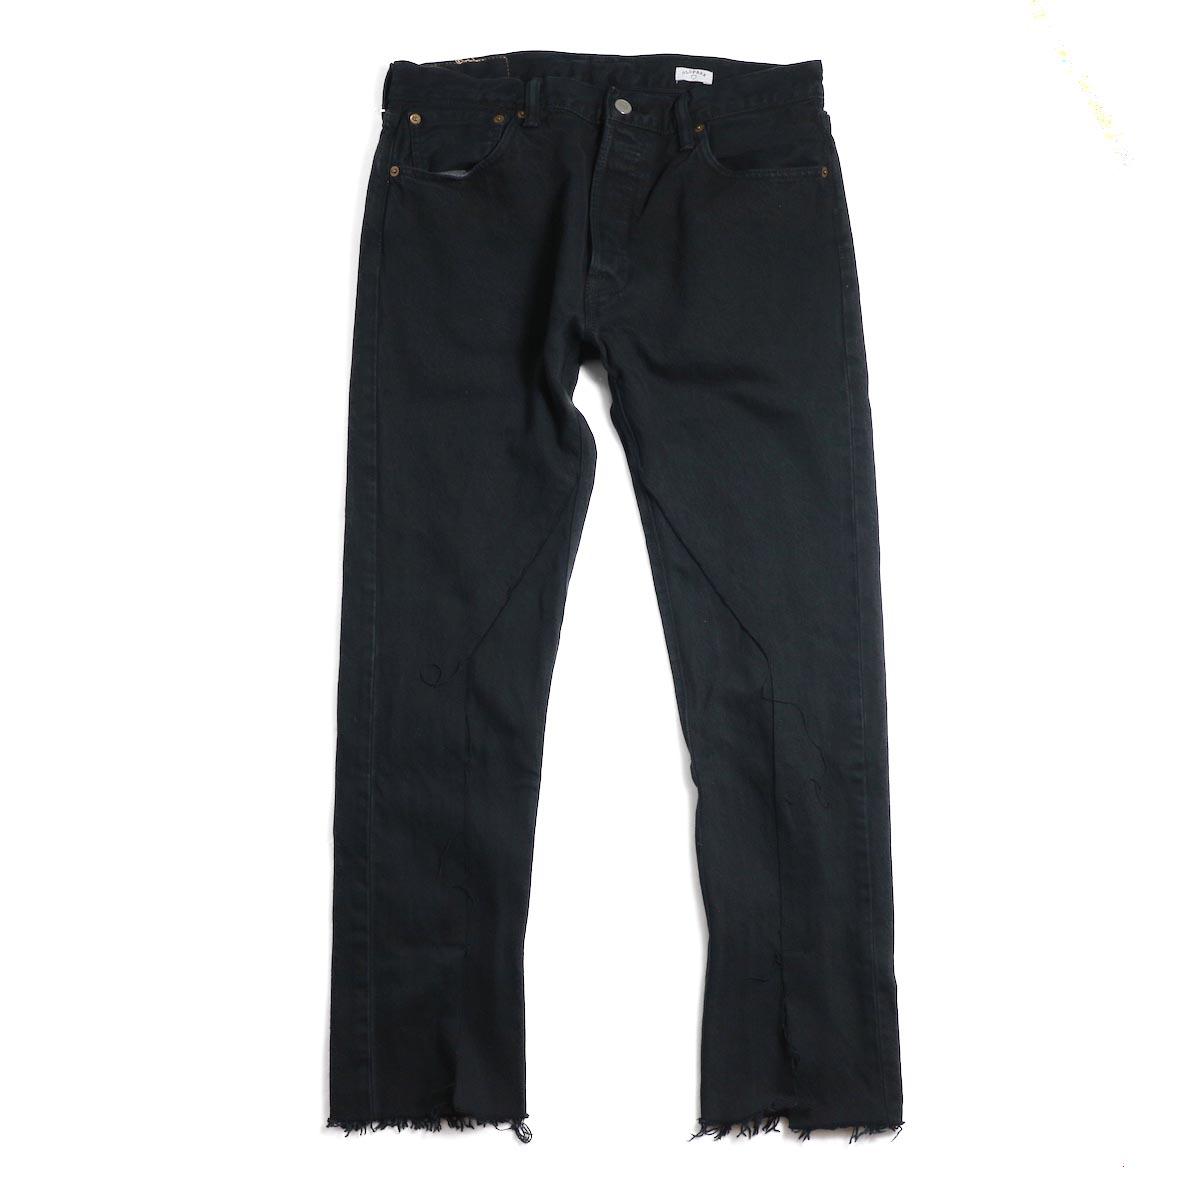 OLD PARK / Slit Jeans -Black Msize(D)